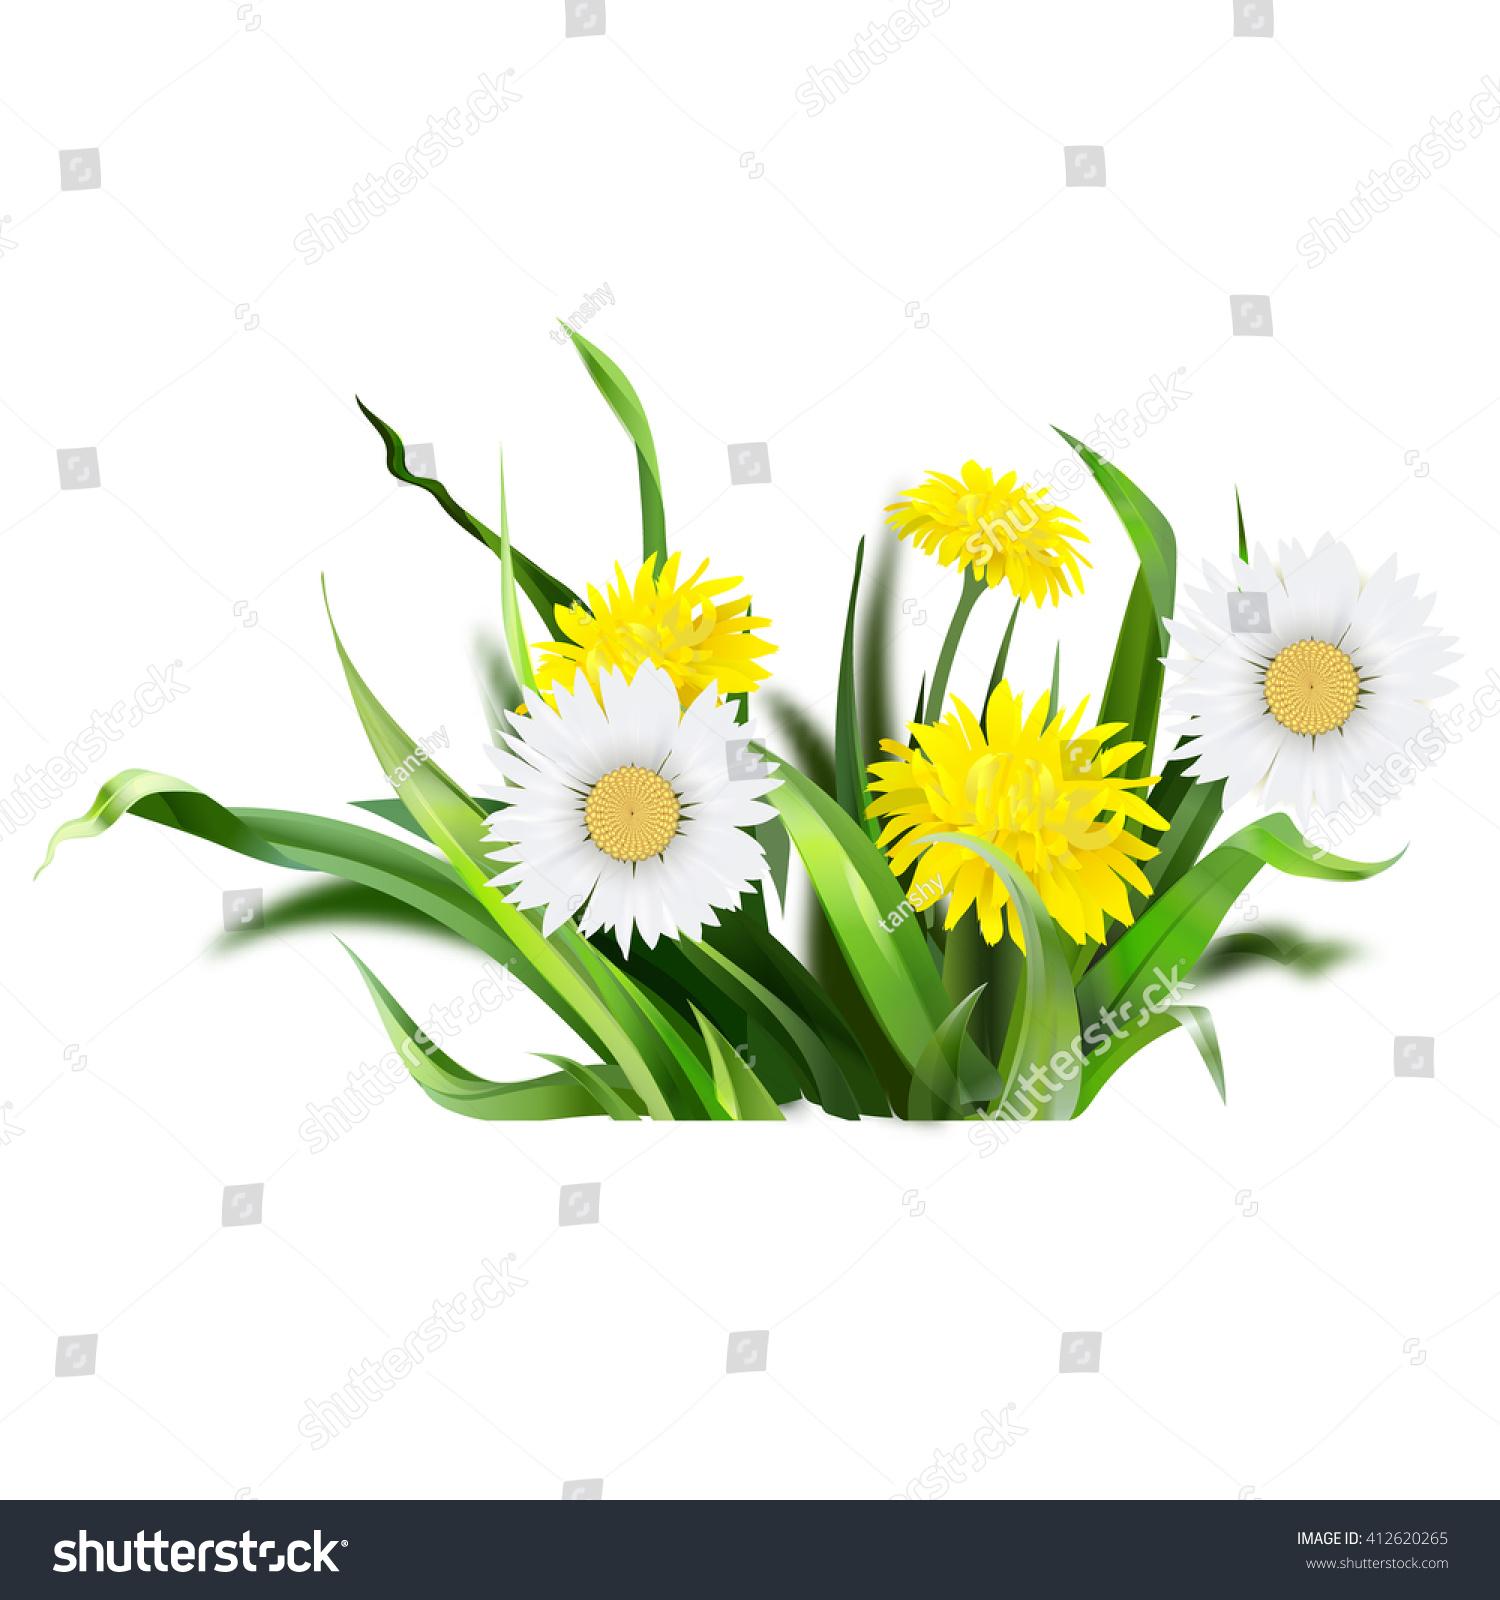 Royalty Free Dandelion Green Grass Yellow Flower 412620265 Stock